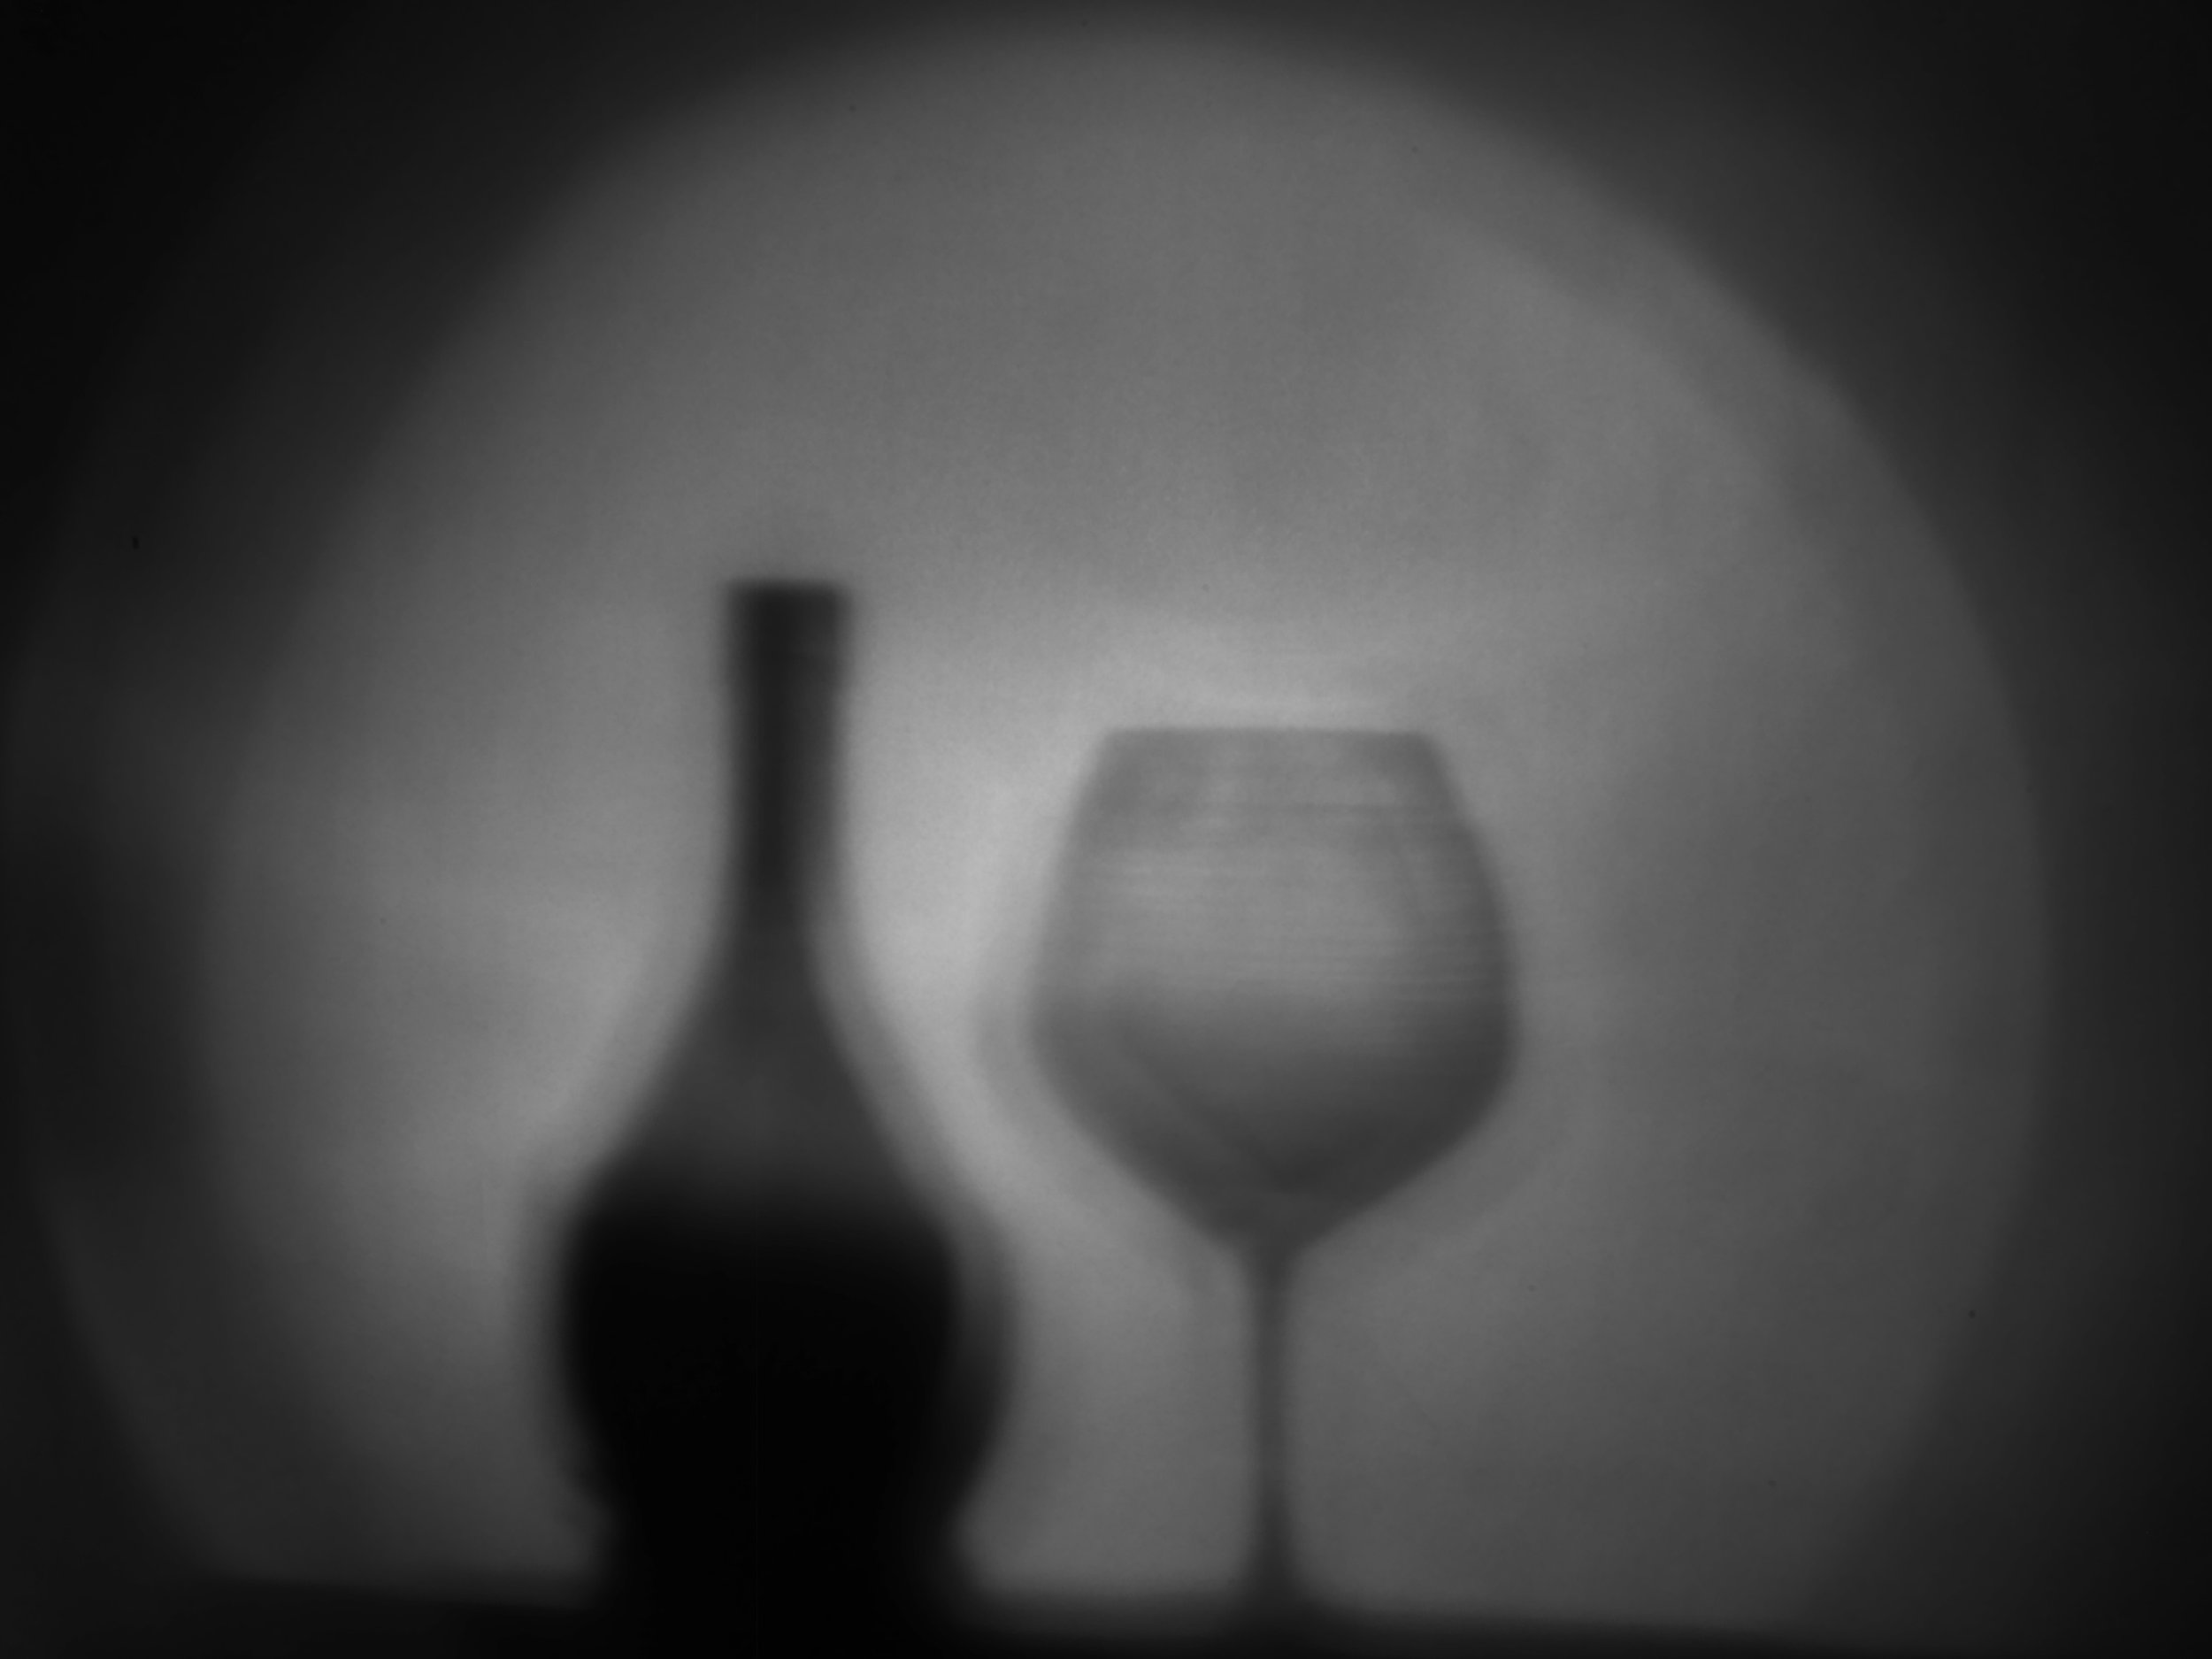 Lightand Shadow in the Future-QEP FINE ART 2018-Happy-Marco Garofalo-Fine Art Photography-2018.jpg